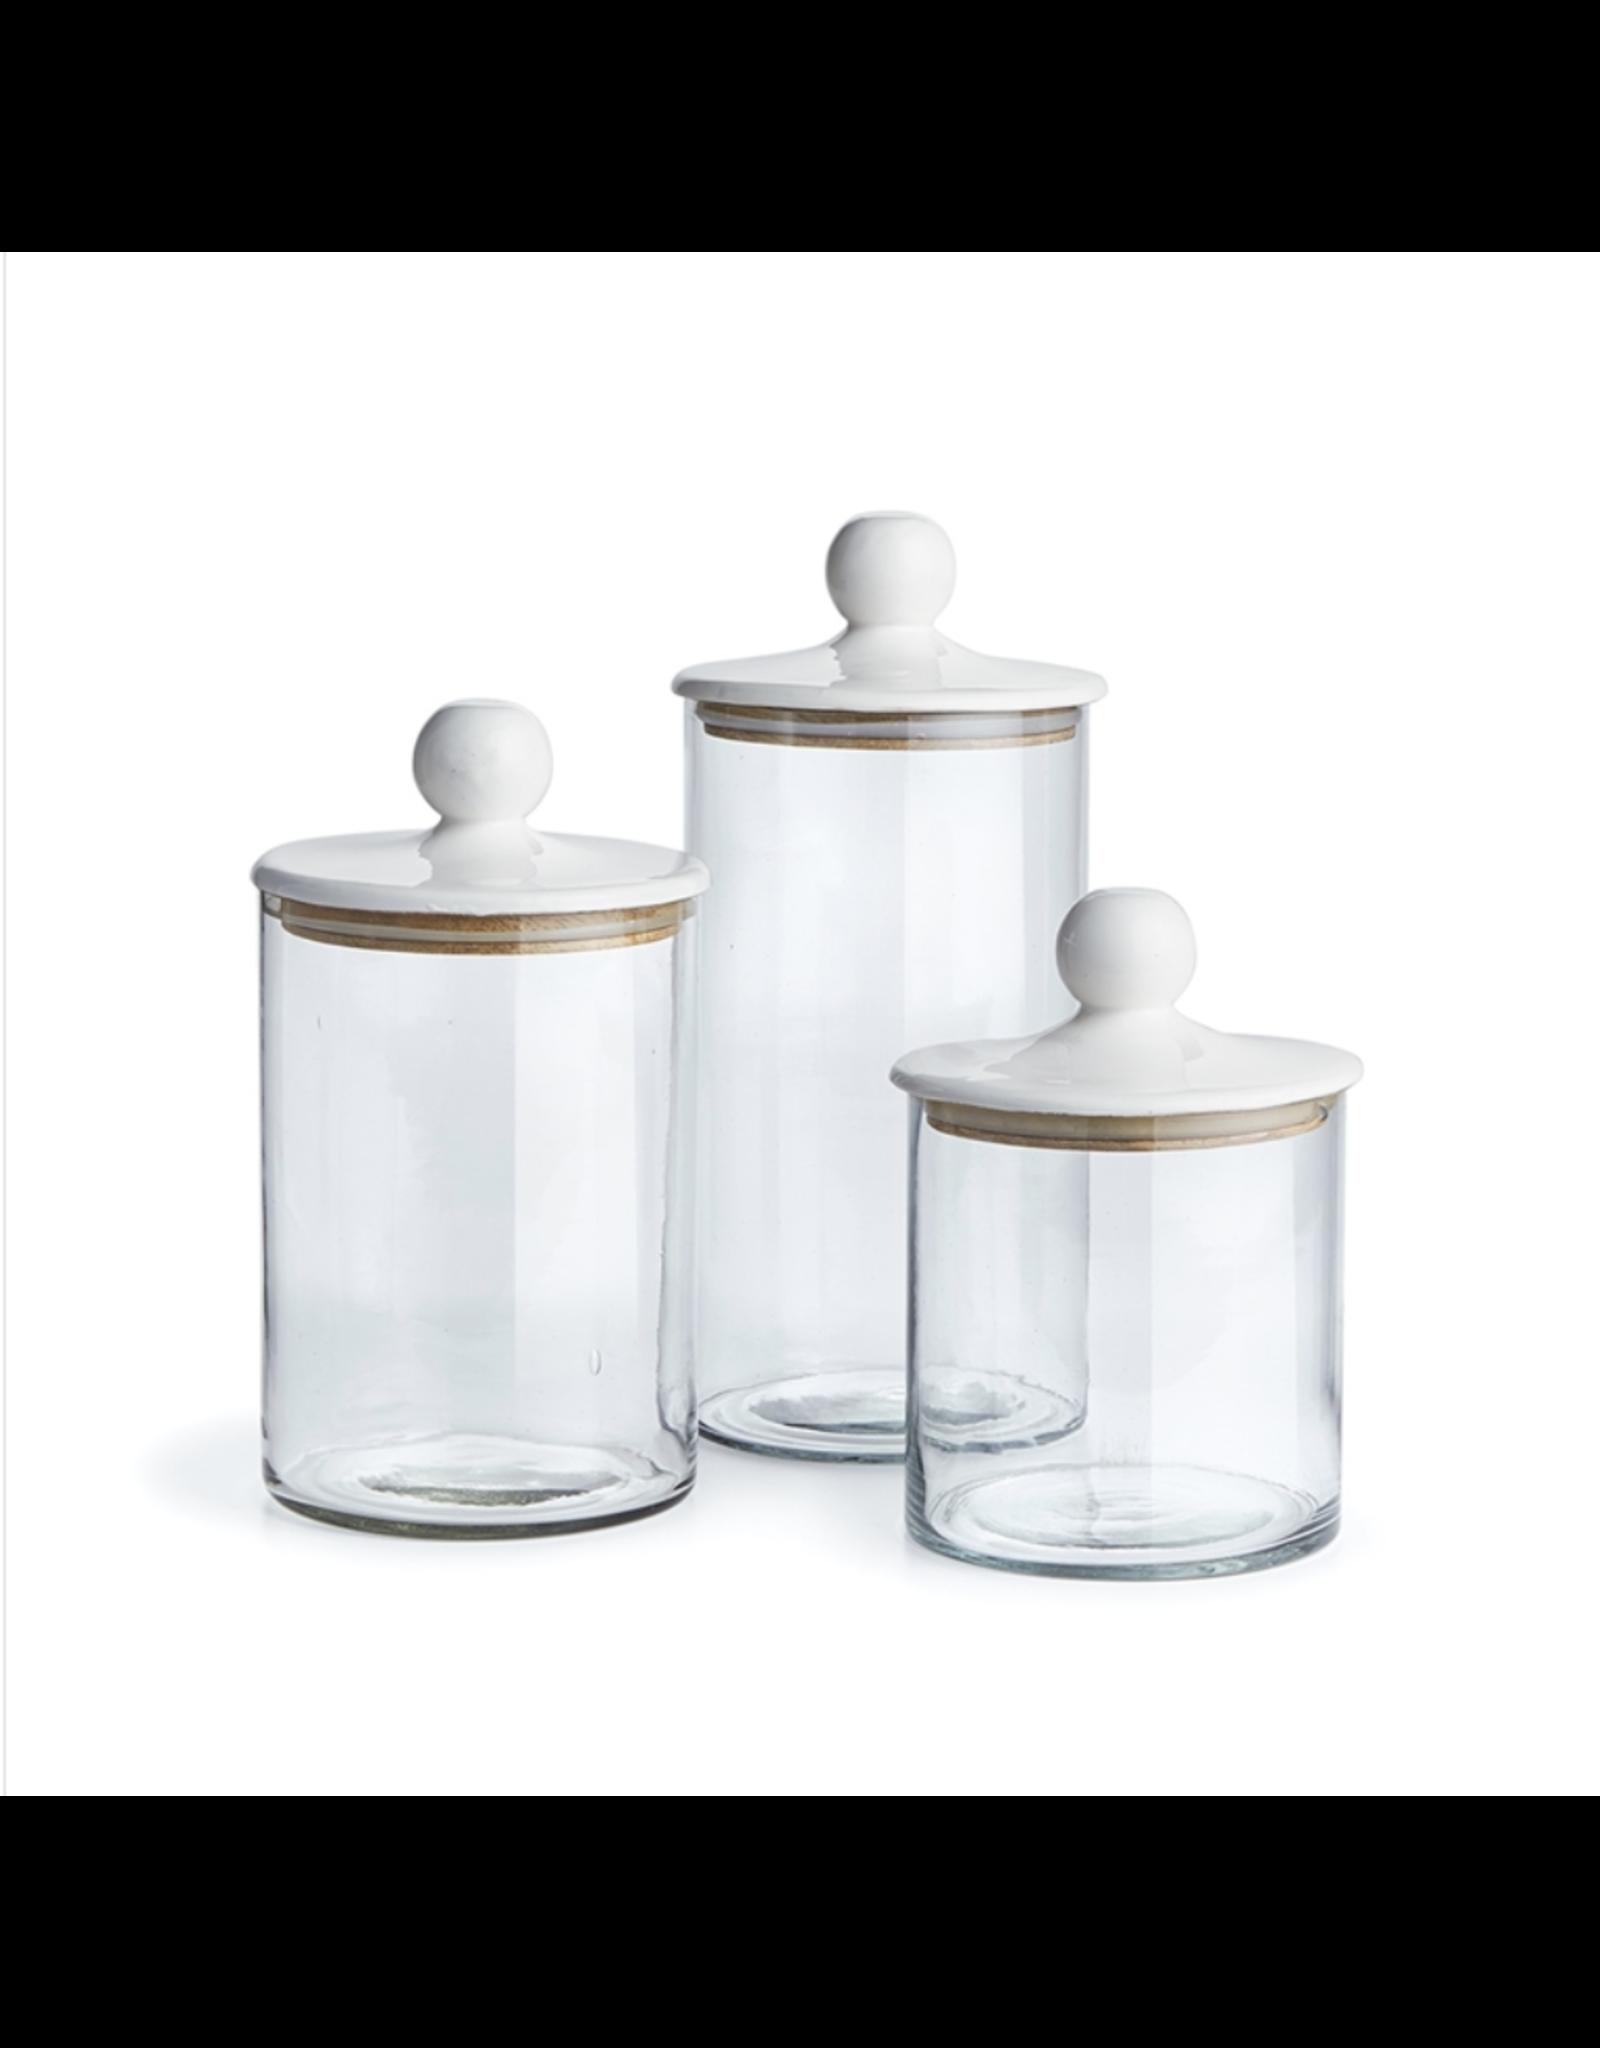 Oak + Arrow Interiors Glass Canisters - Set of 3